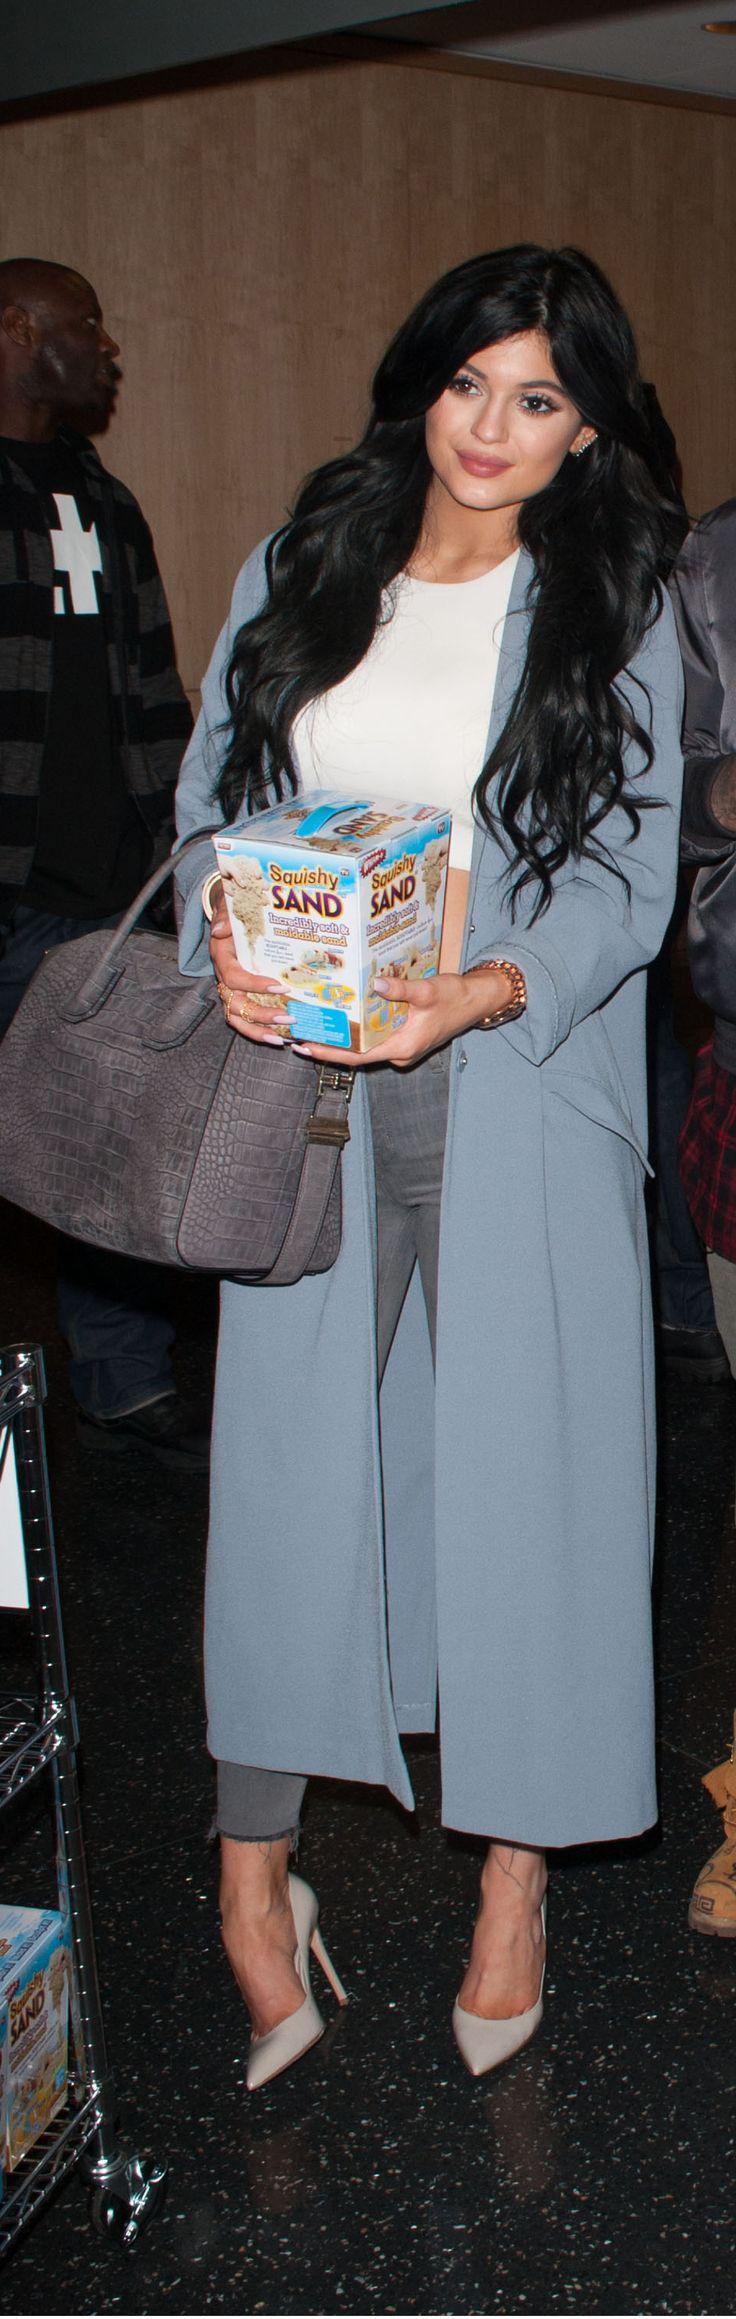 Kylie Jenner Has Been Shopping in Kim Kardashian's Closet